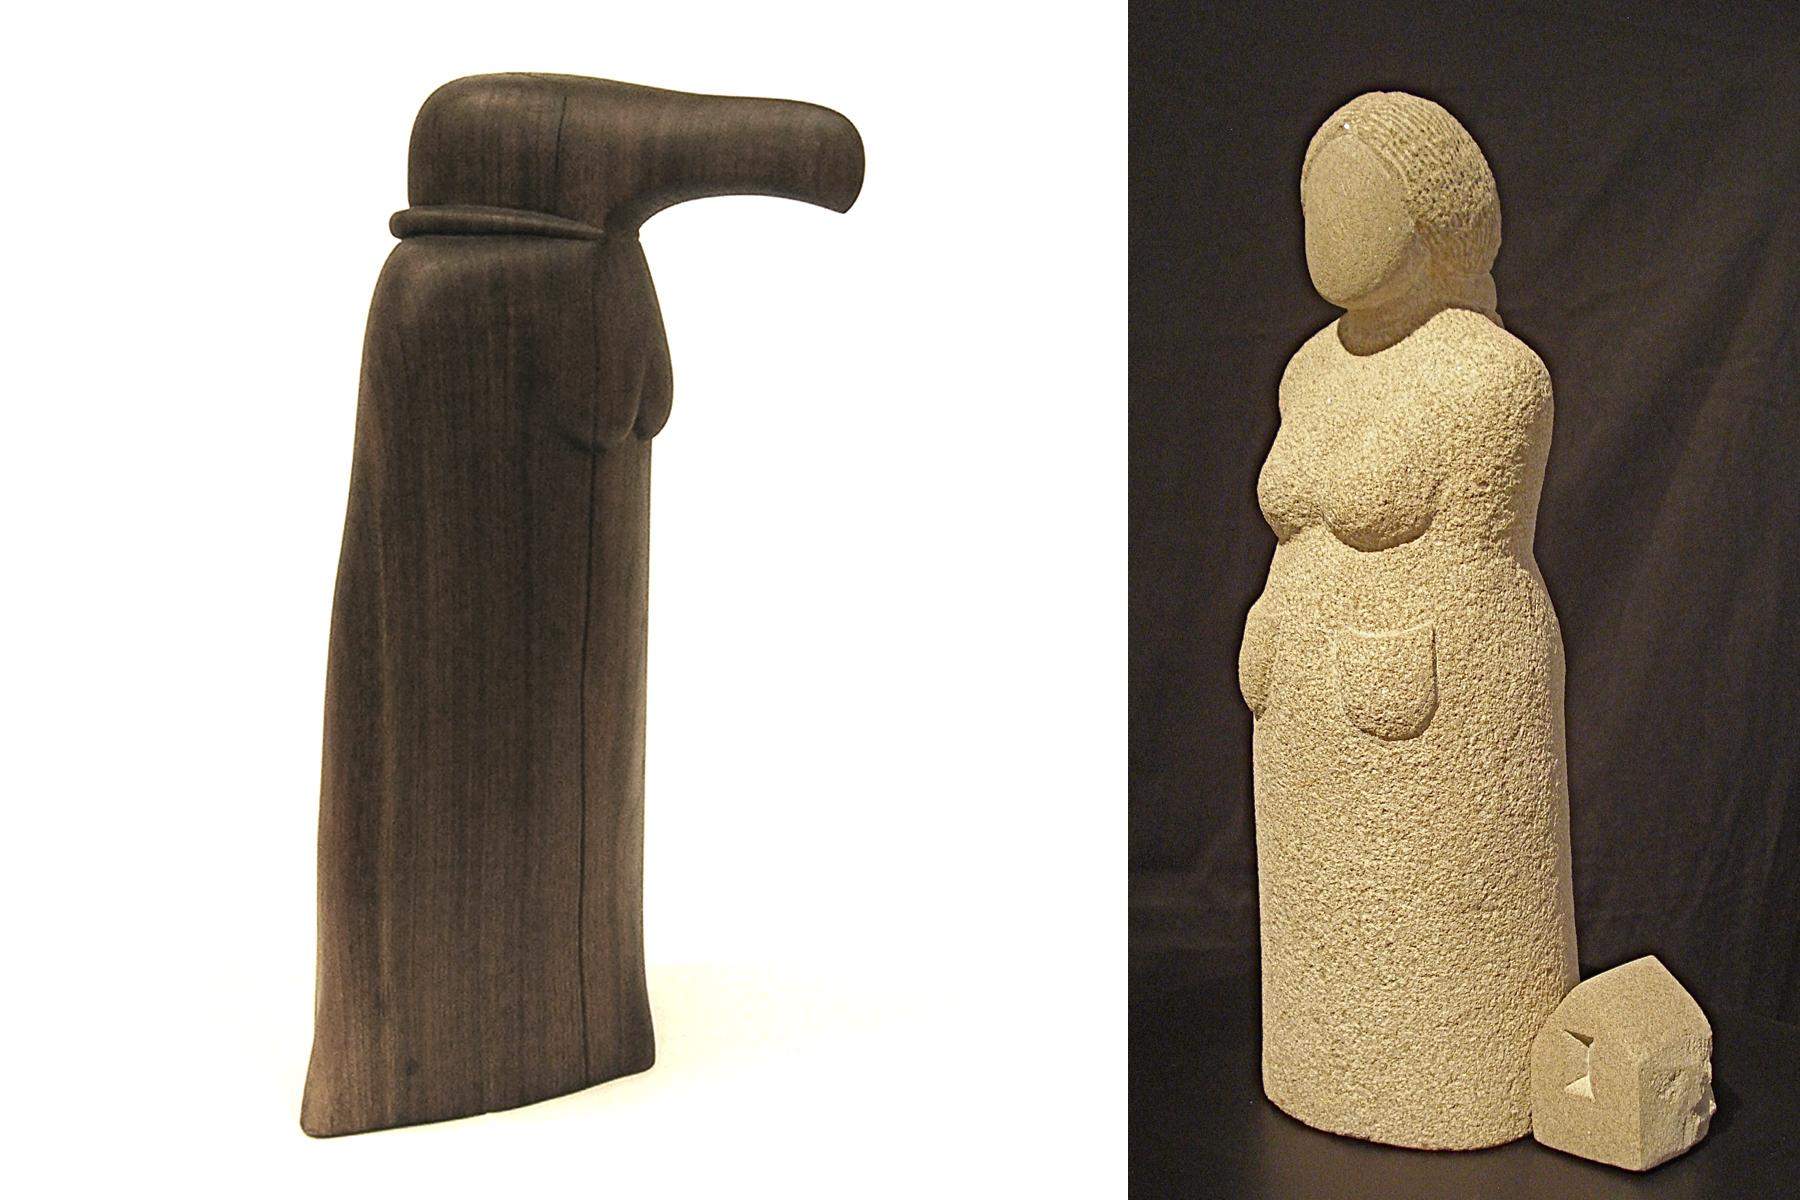 "Images: L to R, Donna Dodson, Condorita, 2013 walnut 23"" tall; Nora Valdez, Set to Go 2012 Indiana Limestone 17""x6""x7""."